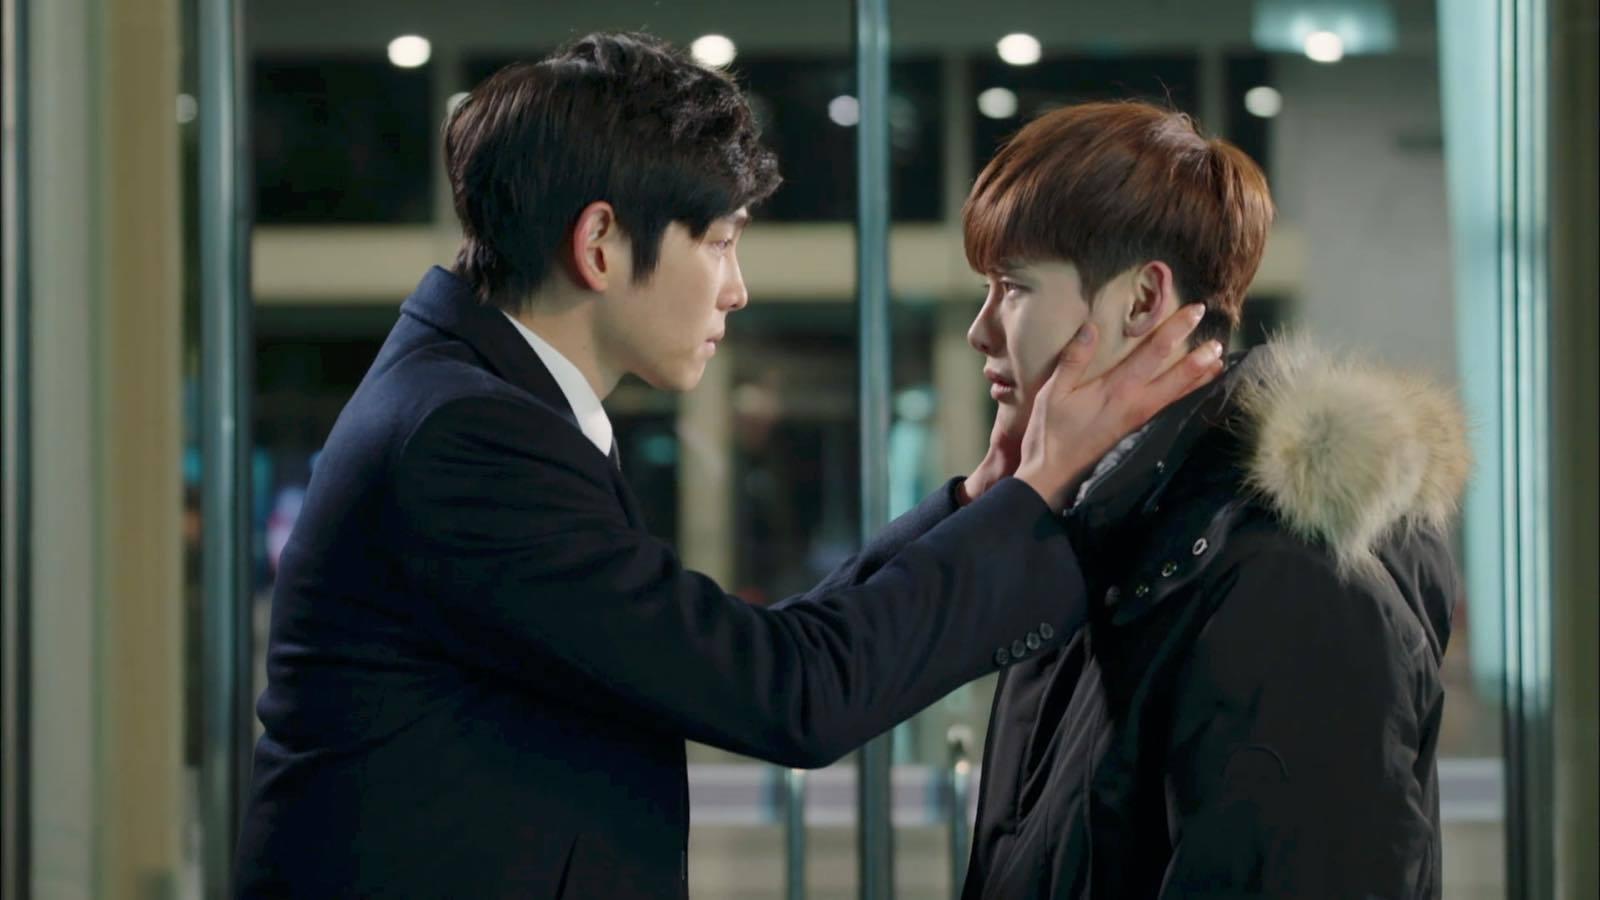 pinocchio korean drama with english subtitles torrent download